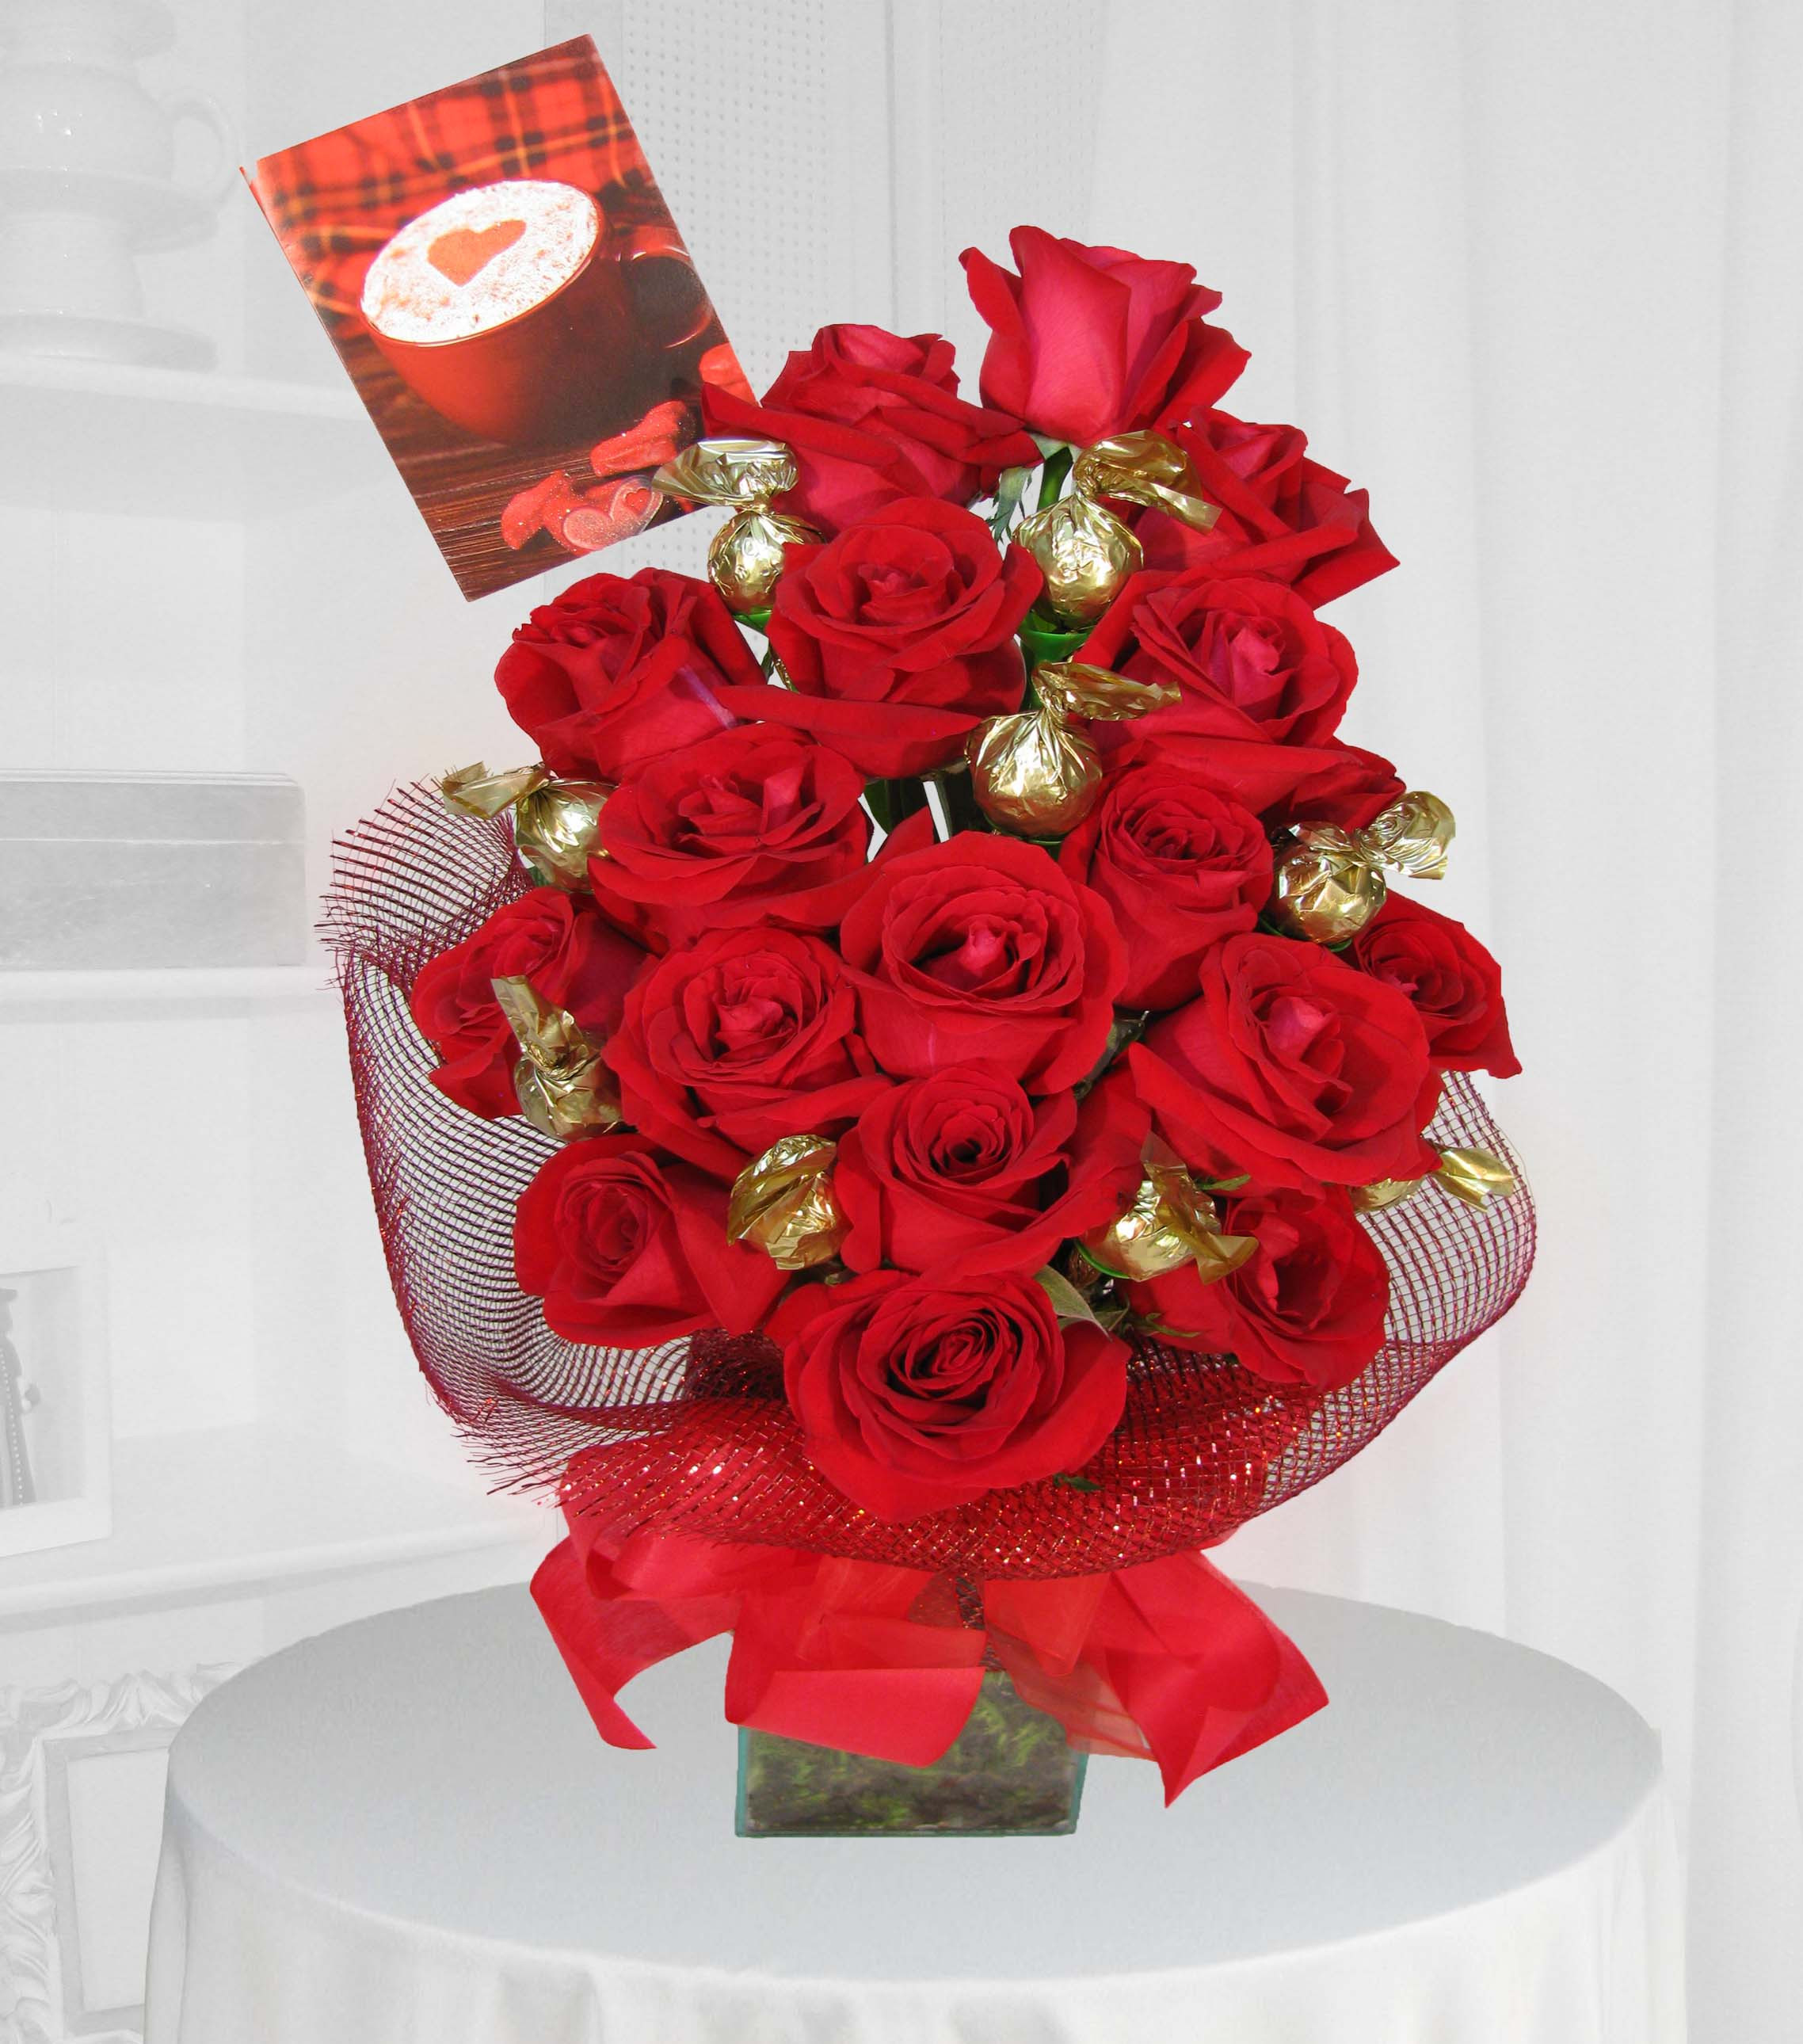 Arranjo de rosas importadas com bombons